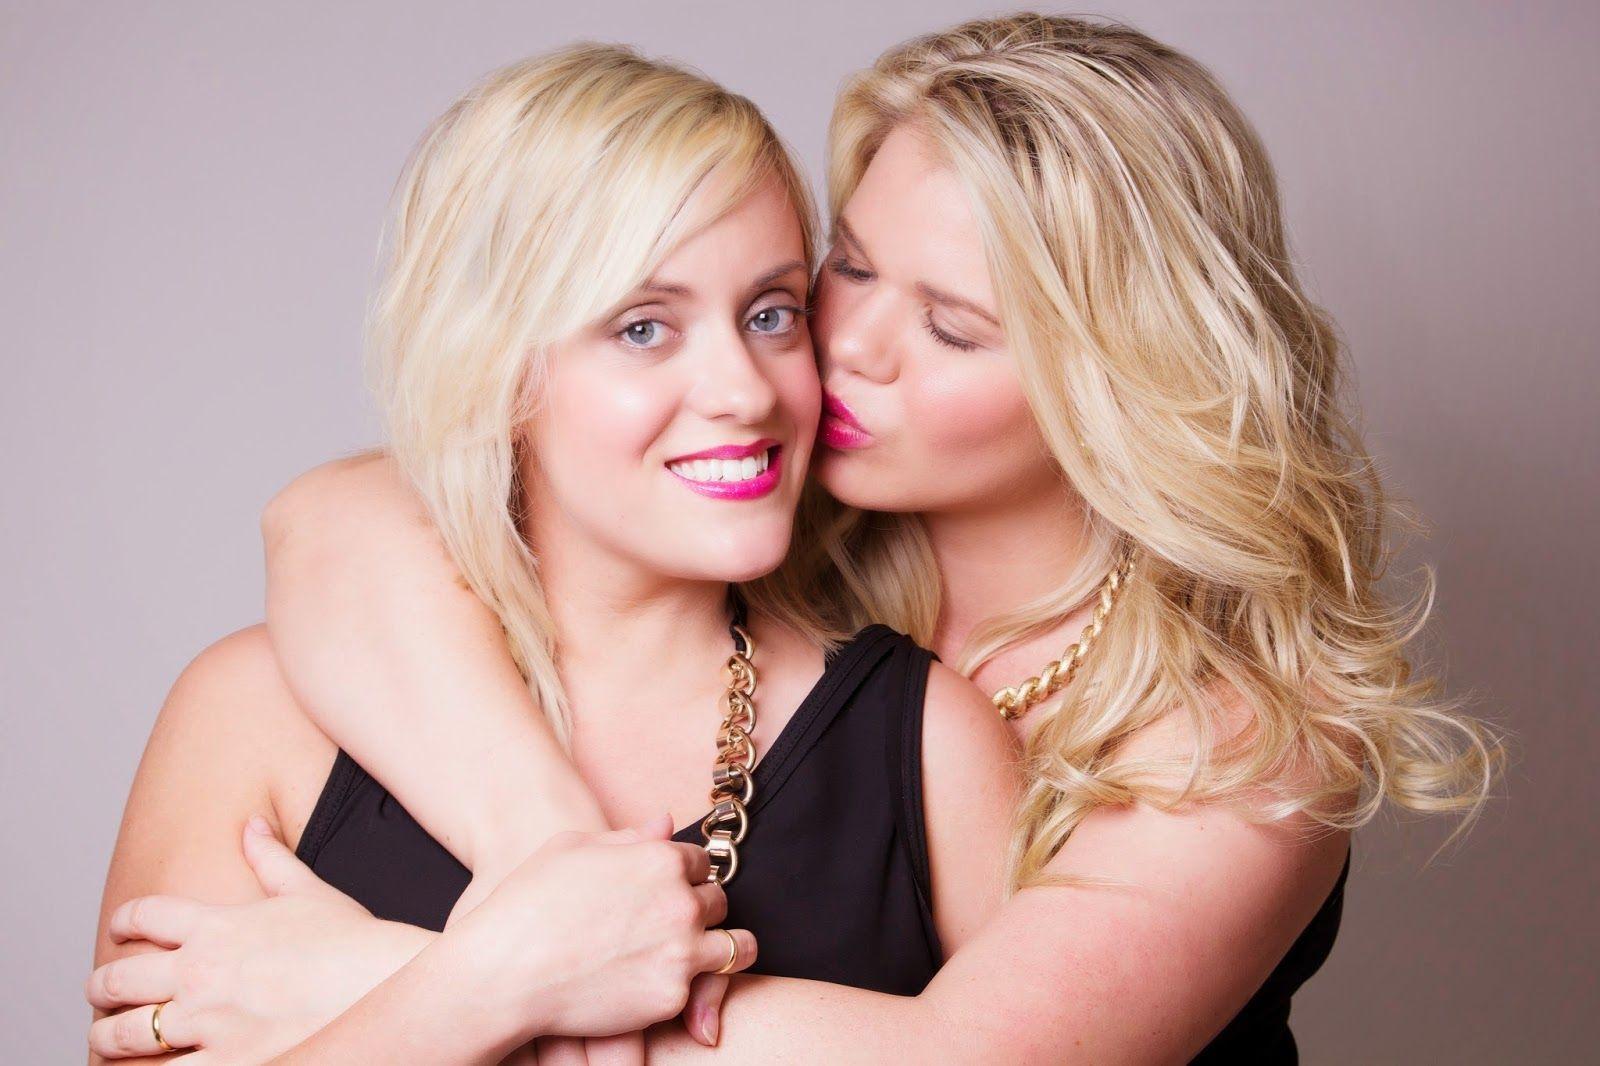 Lipstick lesbian pics